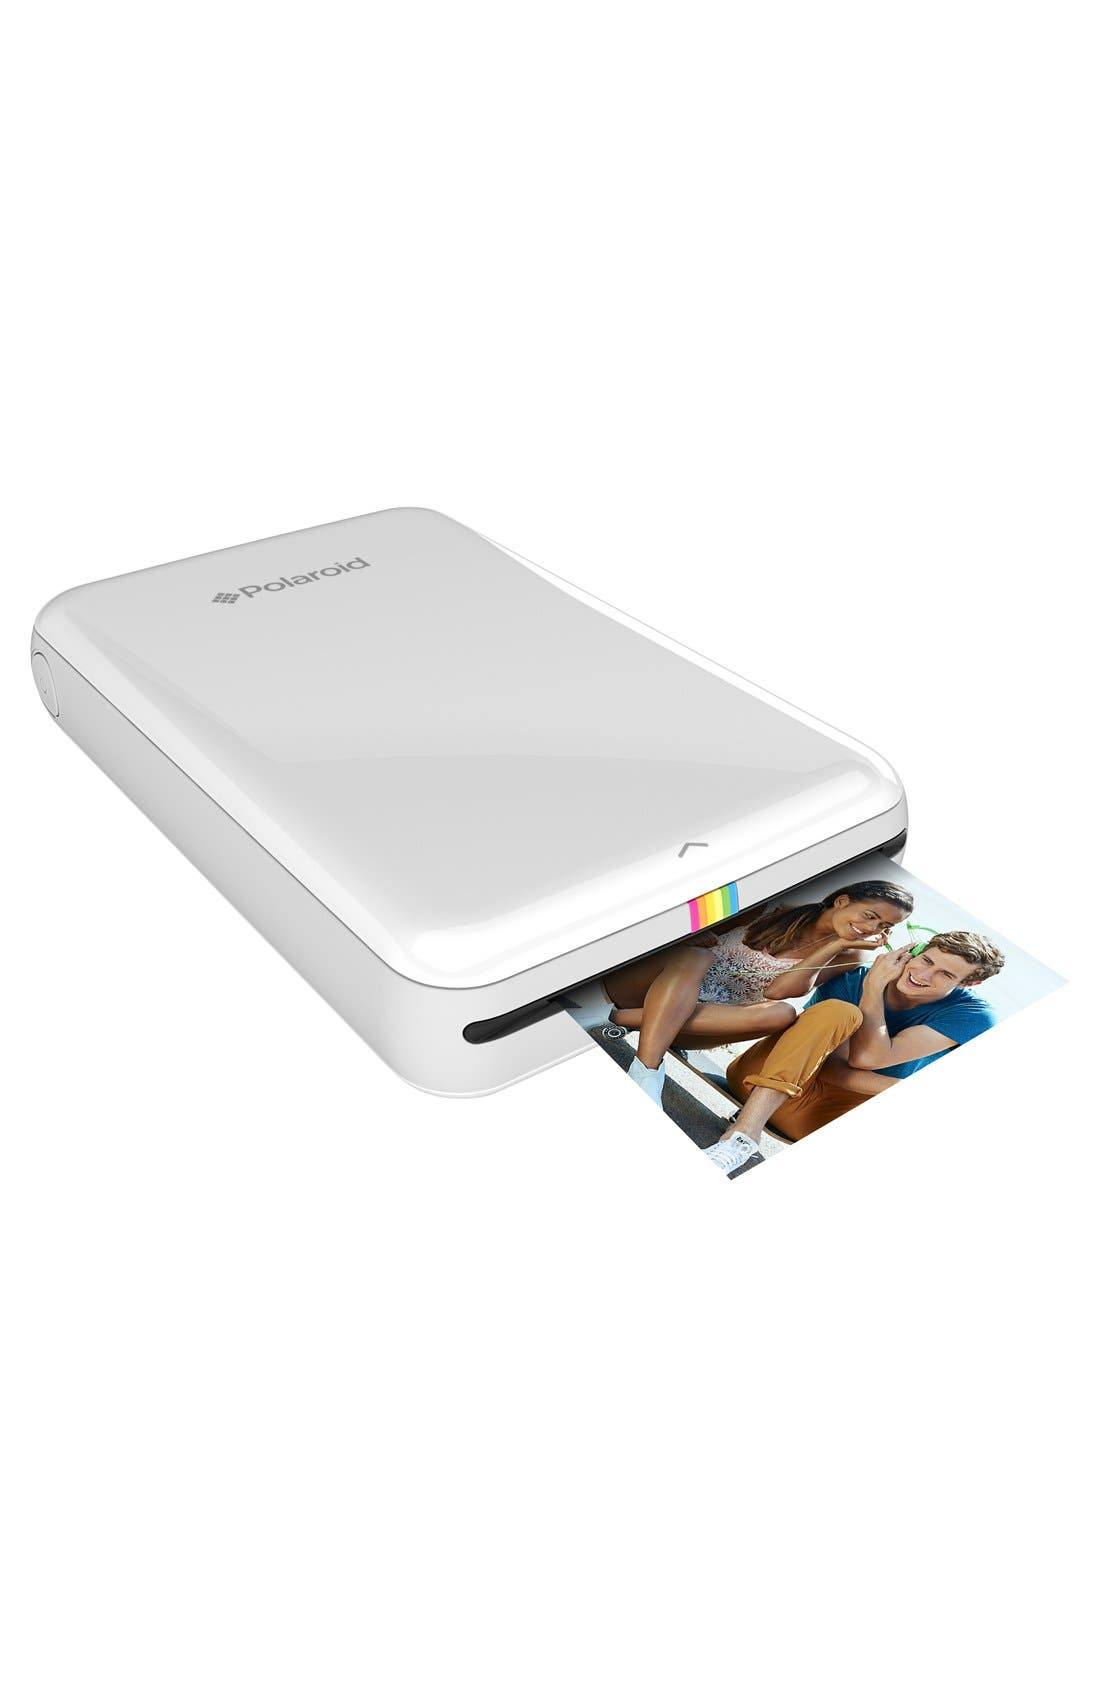 Main Image - Polaroid 'Zip' Mobile Instant Photo Printer